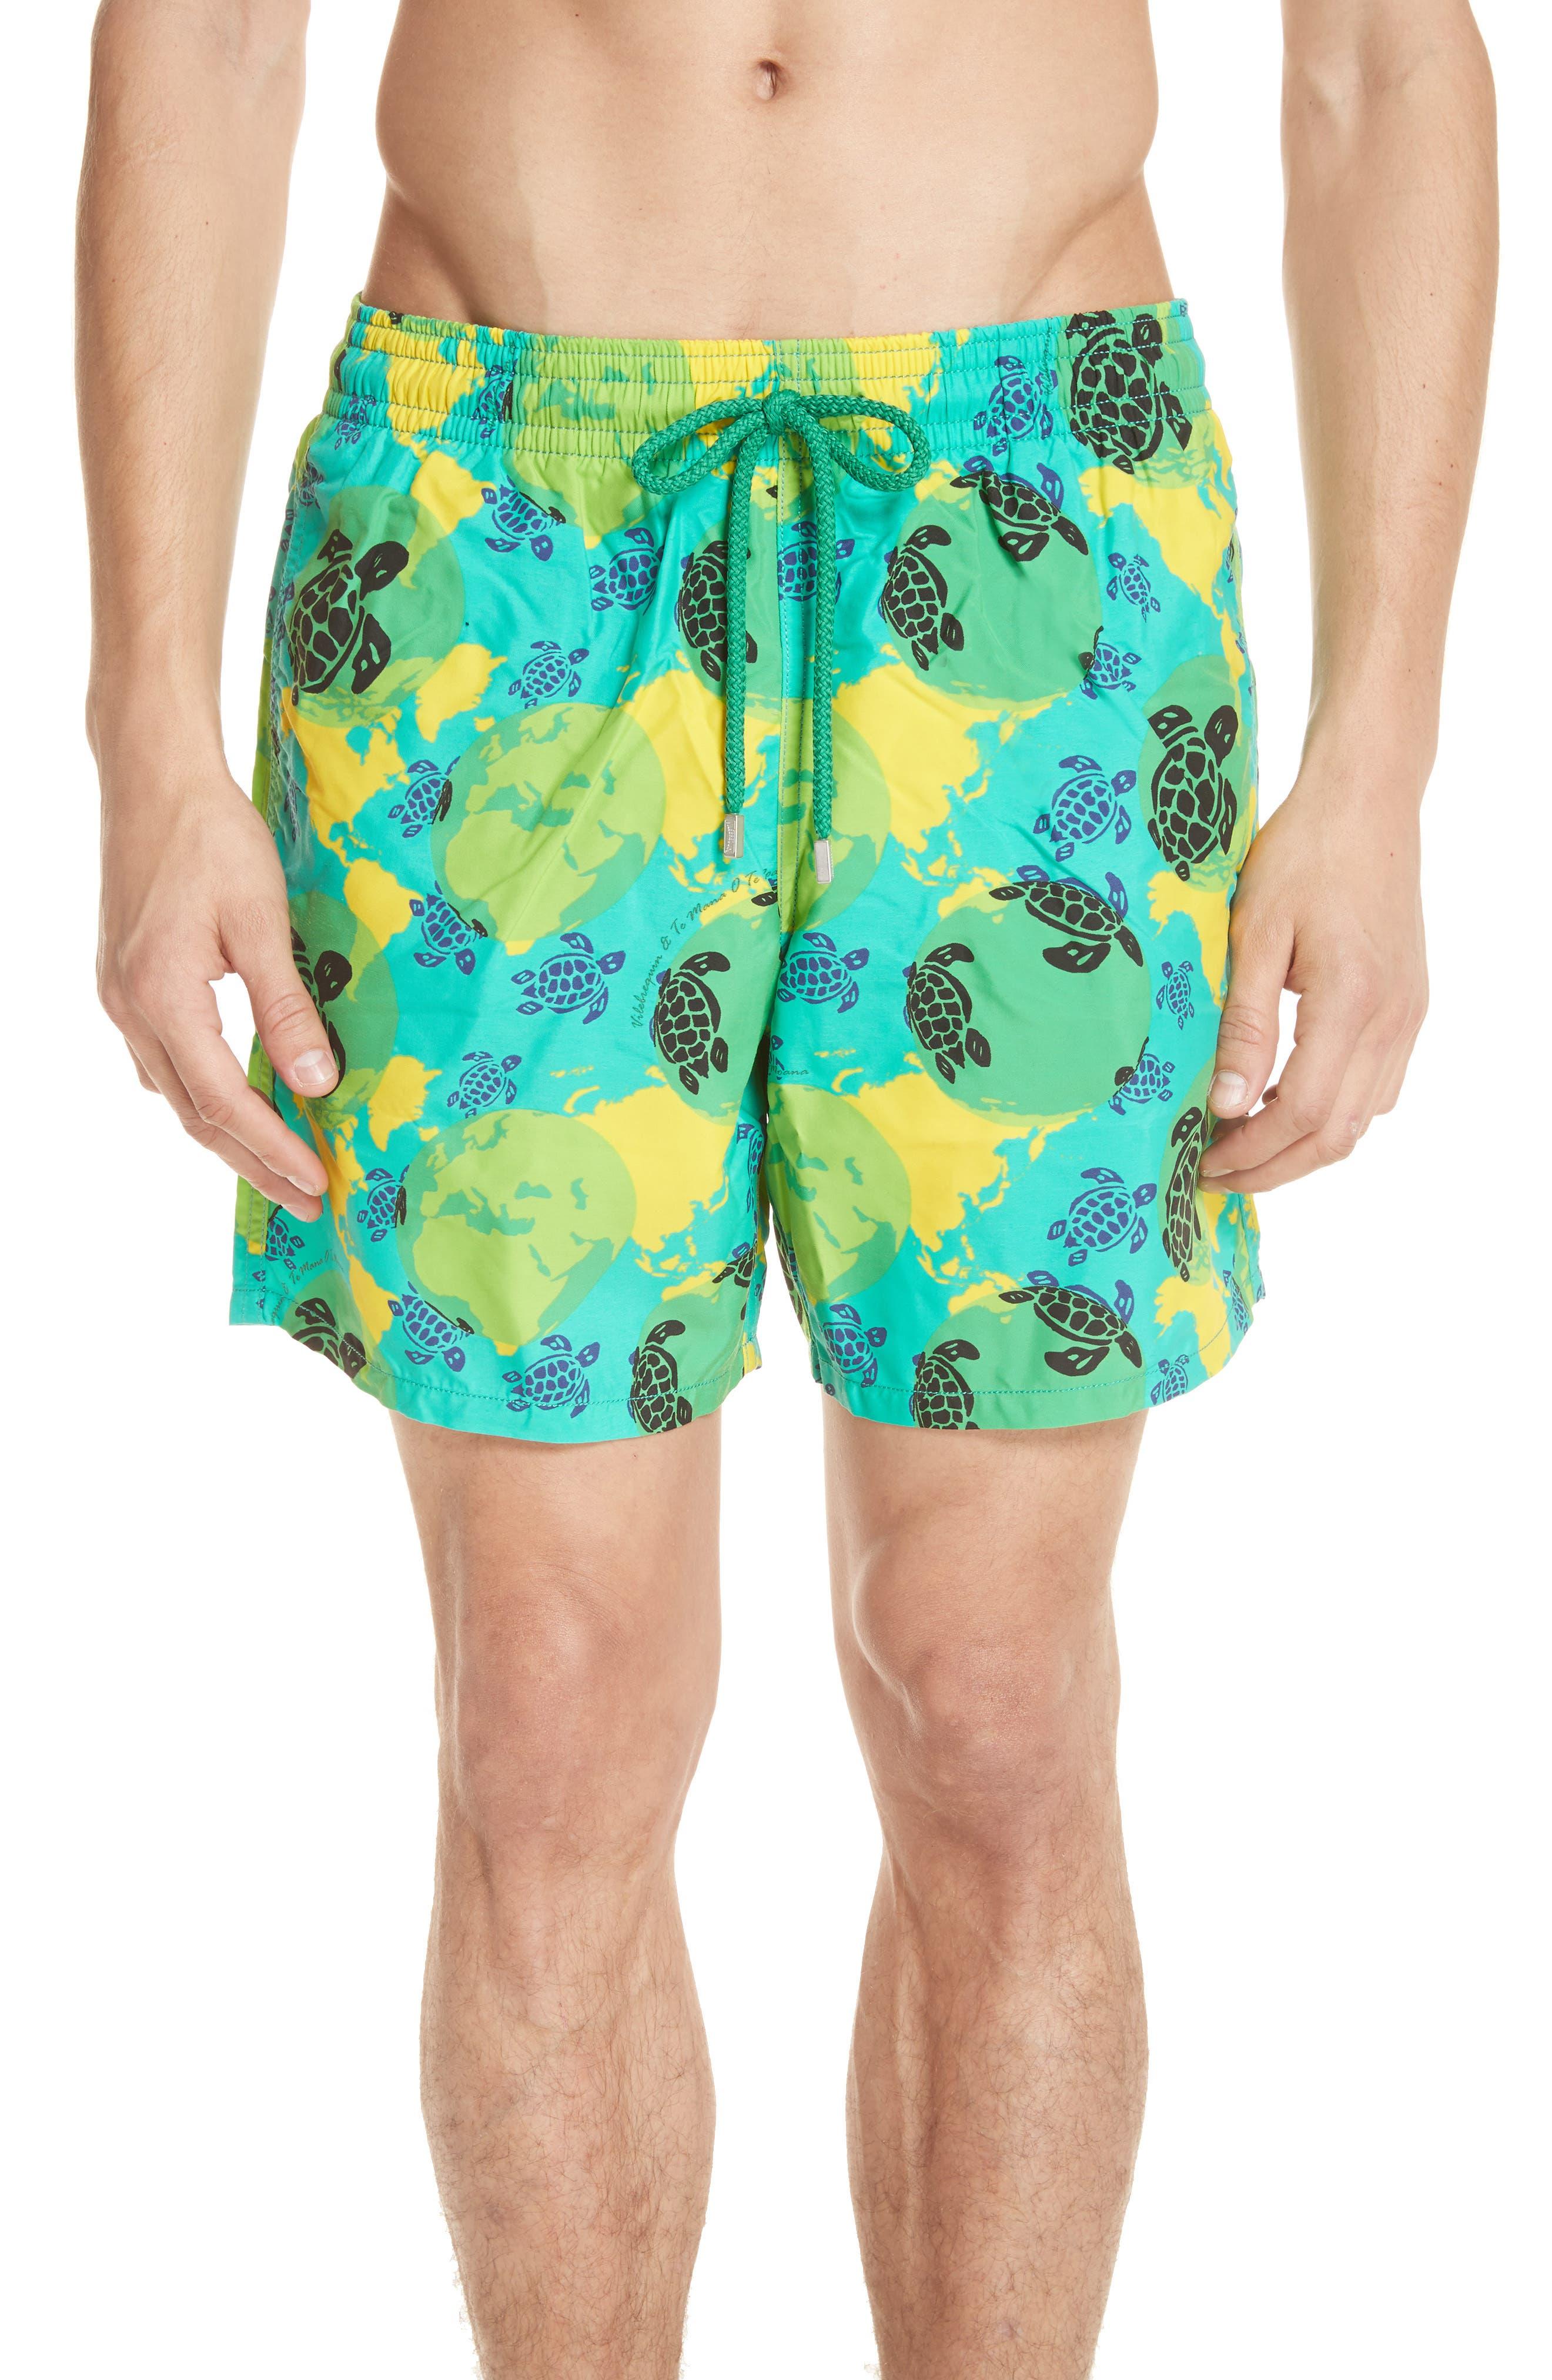 Eco Turtle Print Swim Trunks,                             Main thumbnail 1, color,                             VERONESE GREEN